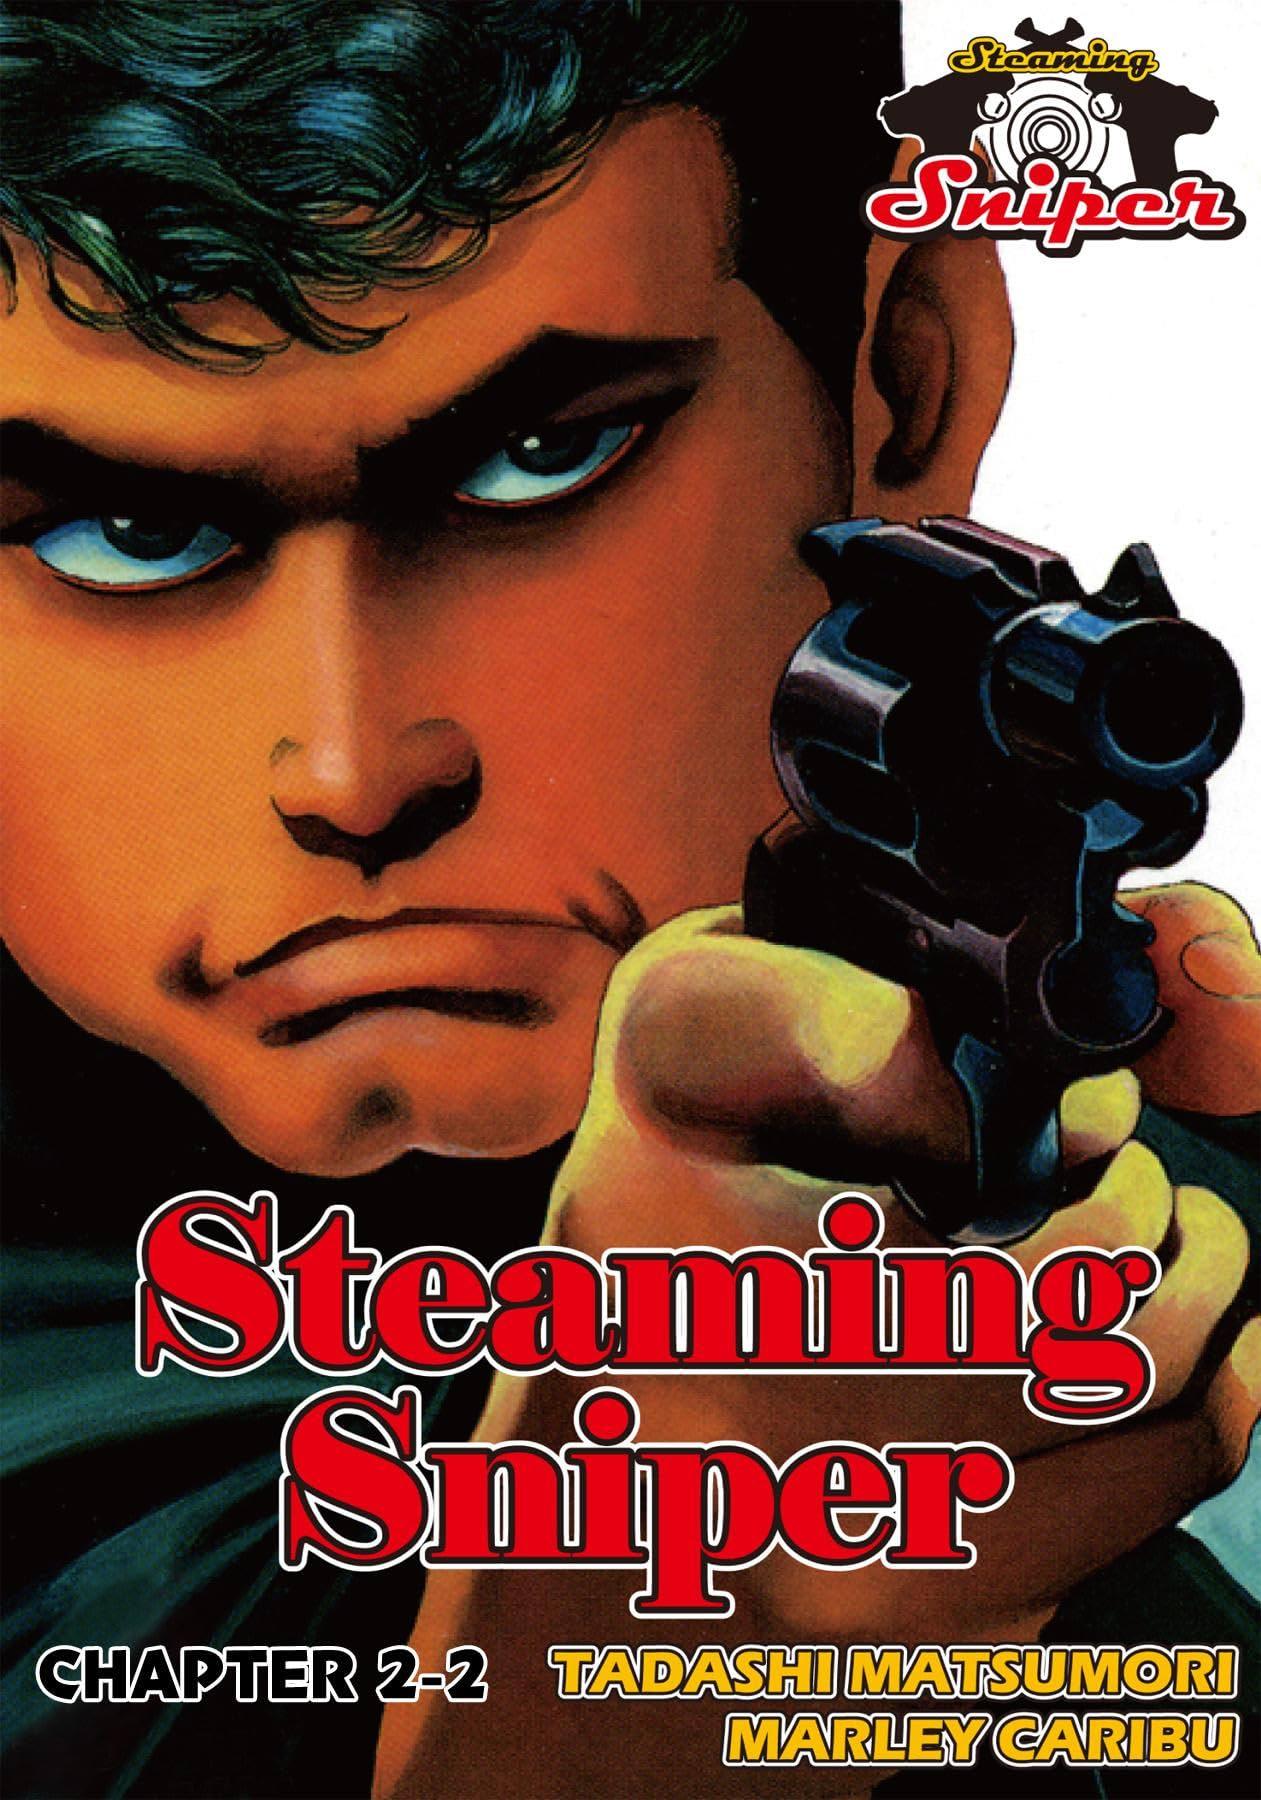 STEAMING SNIPER #13